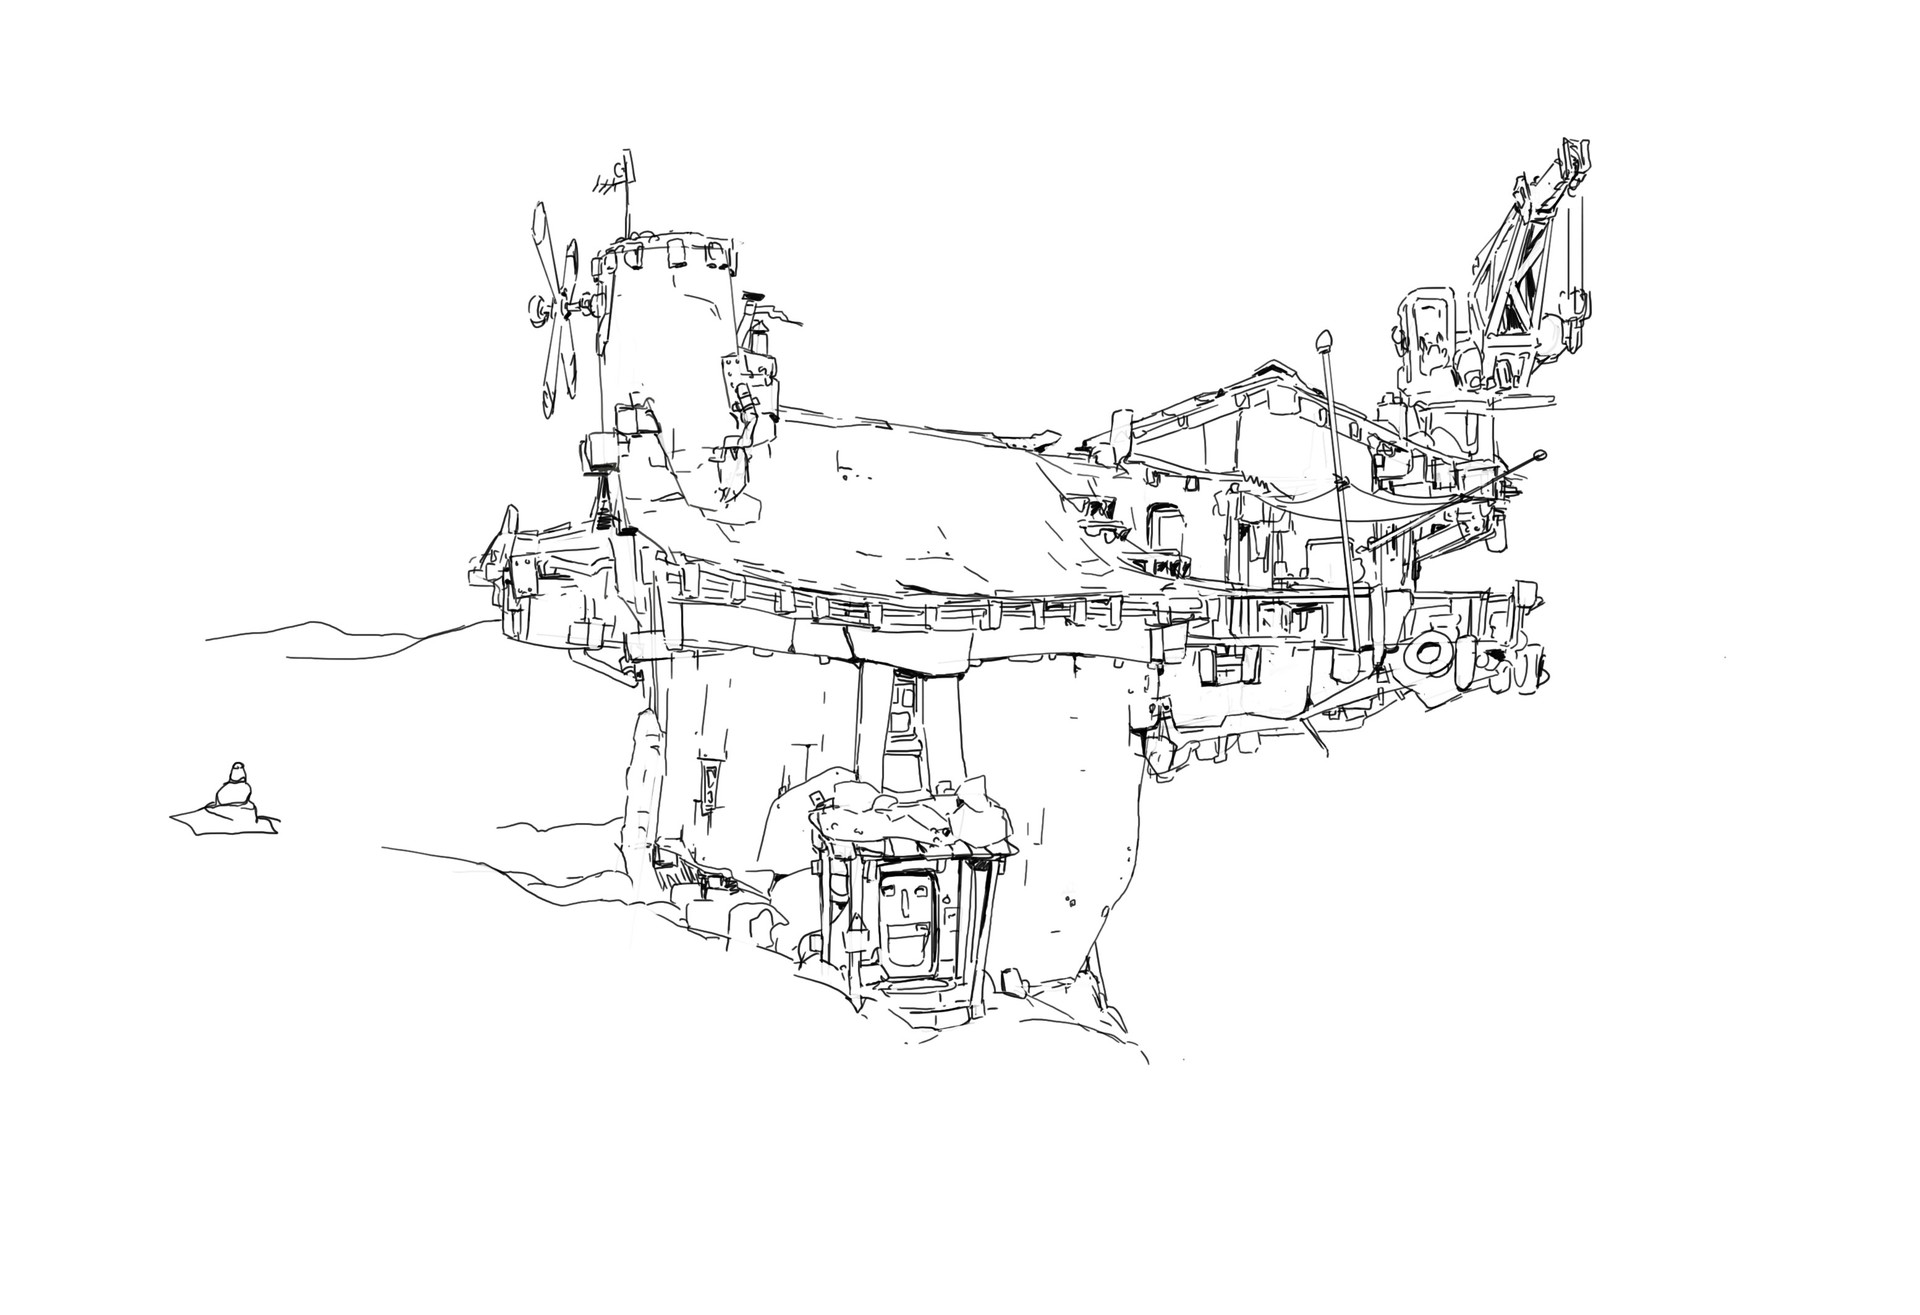 Simon kopp random sketches18 1 3